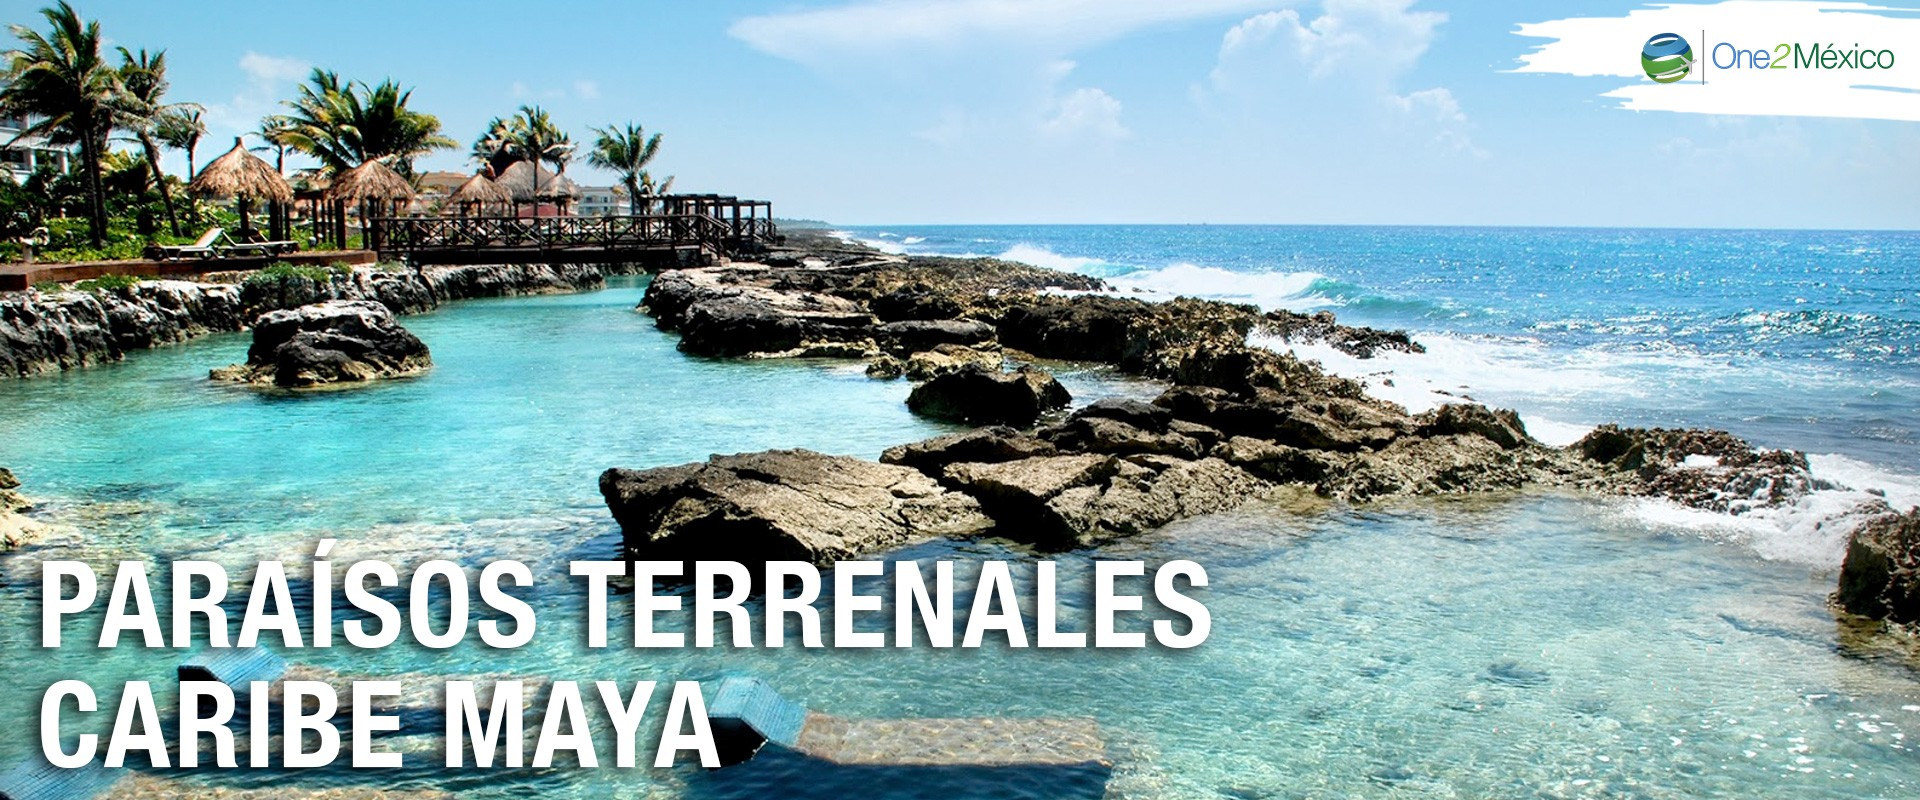 Paraísos Terrenales Caribe Maya